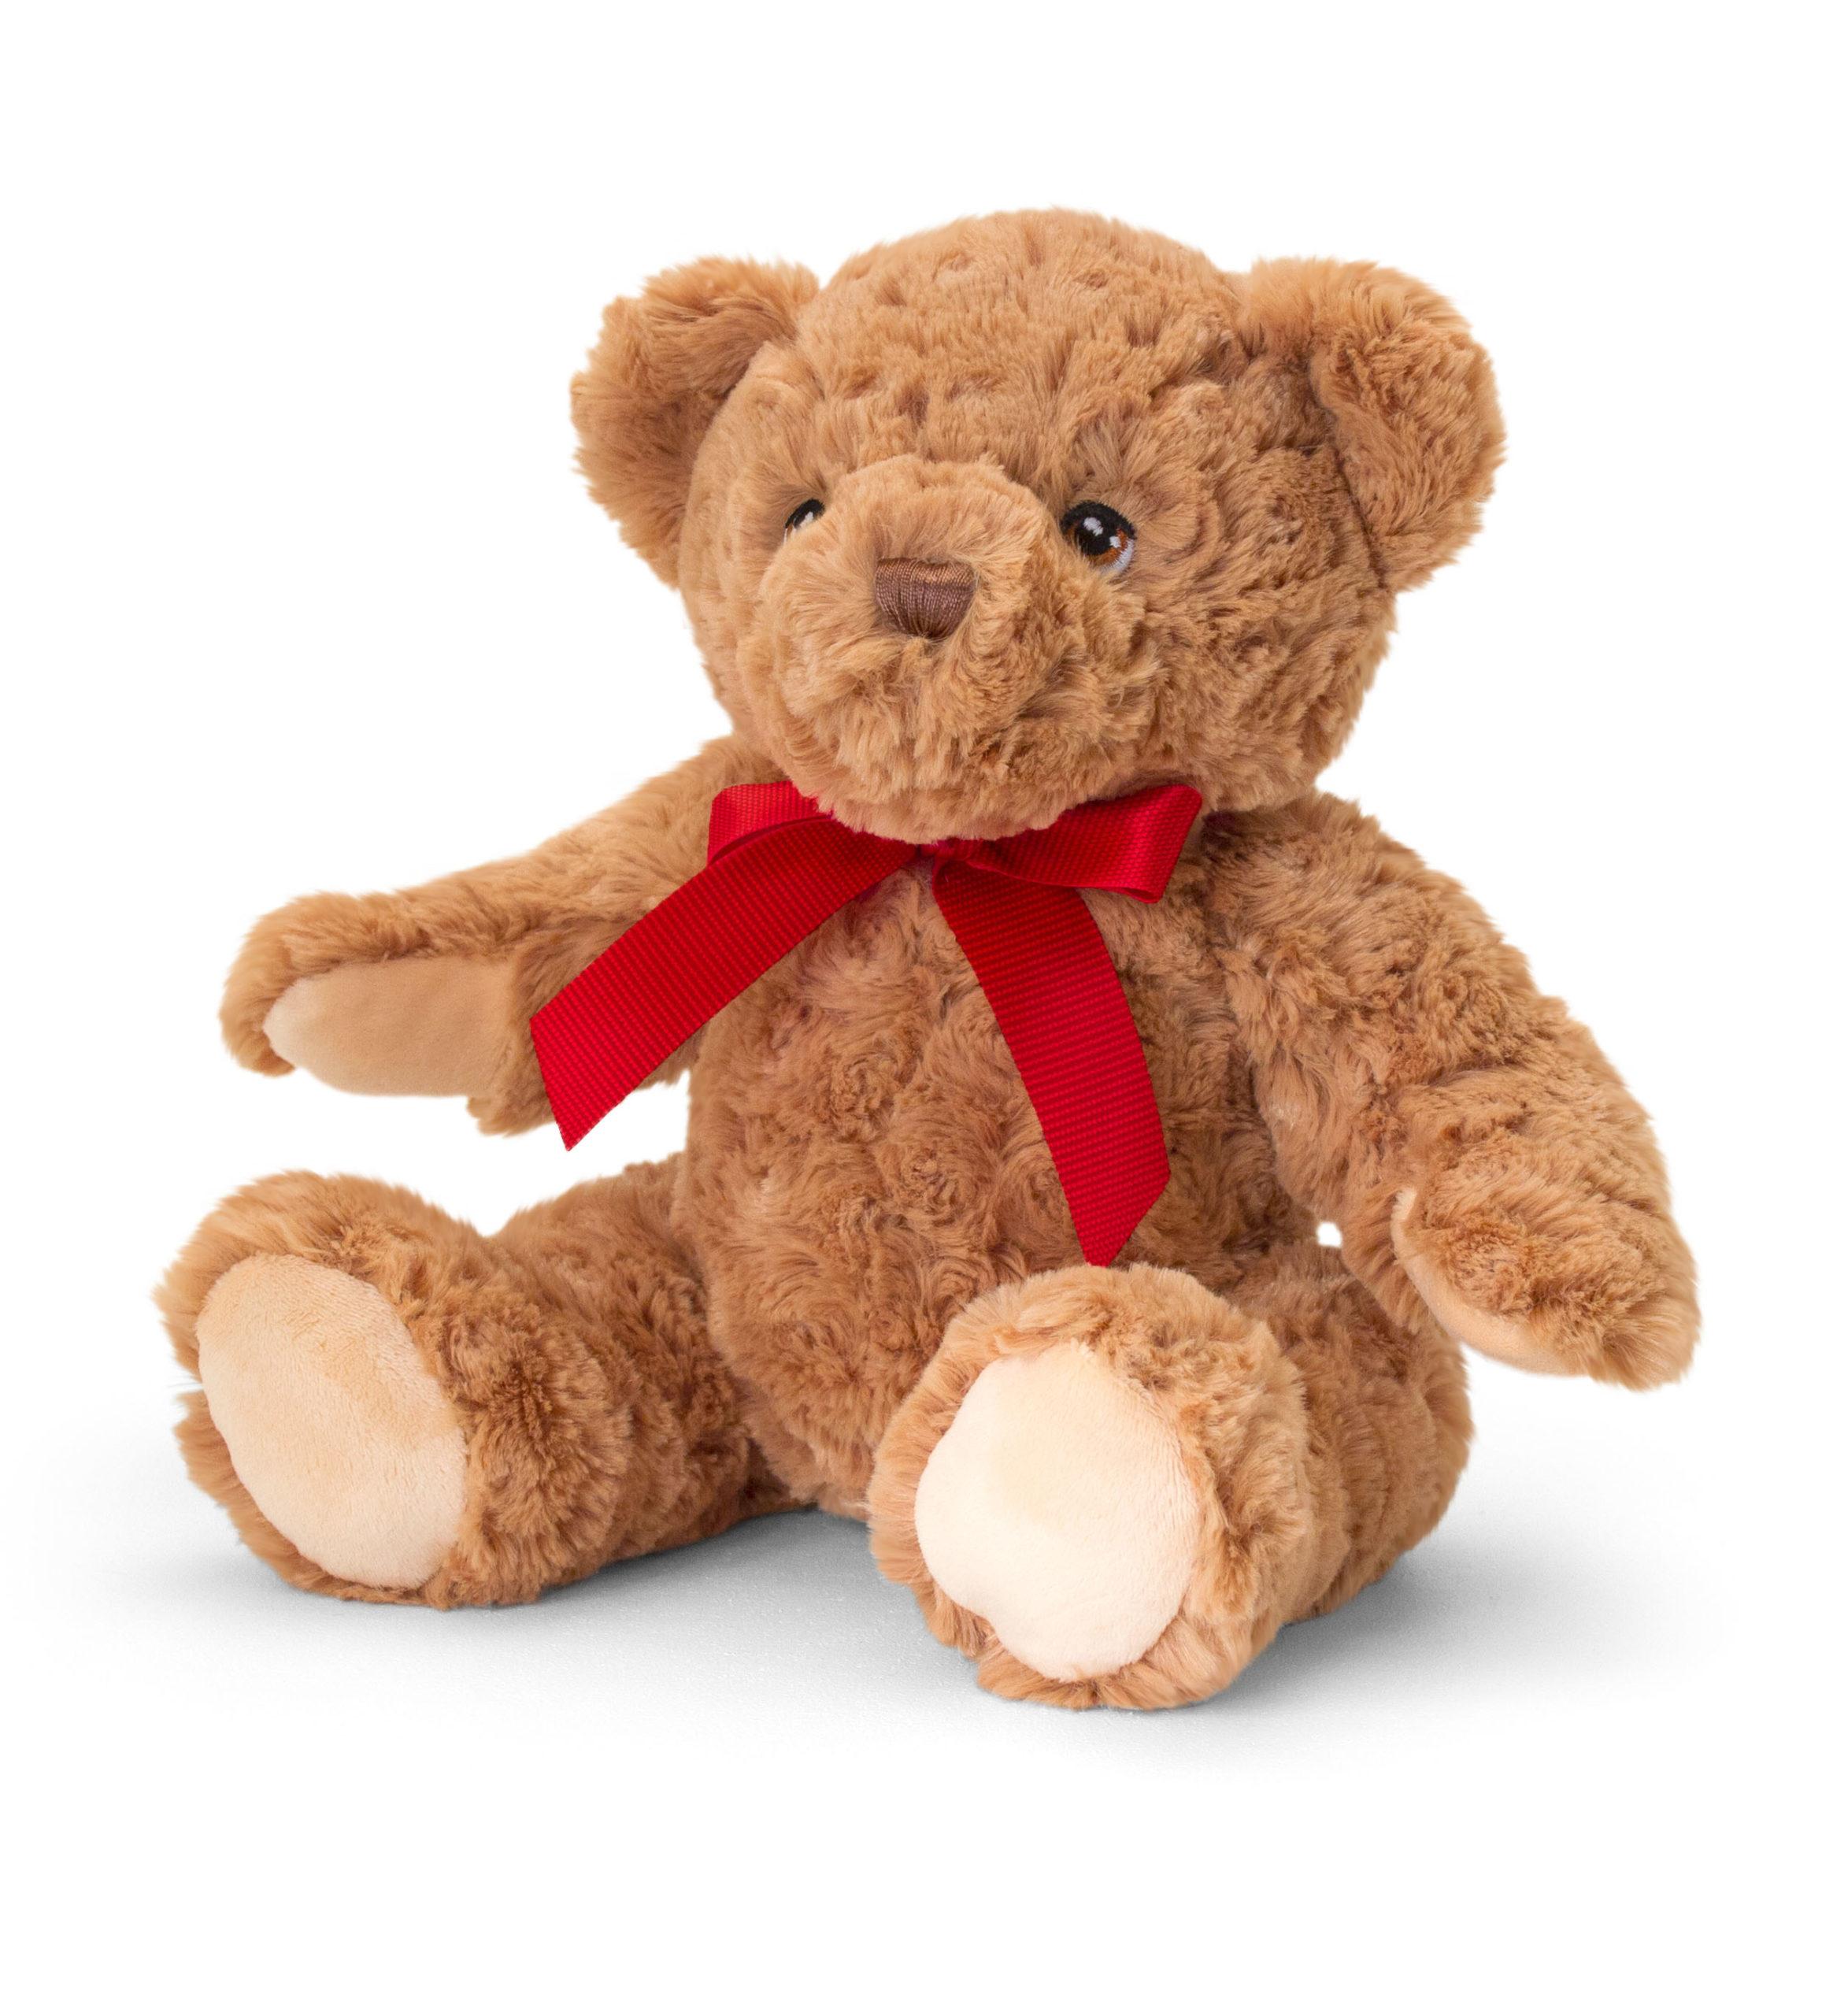 20cm Keeleco Teddy